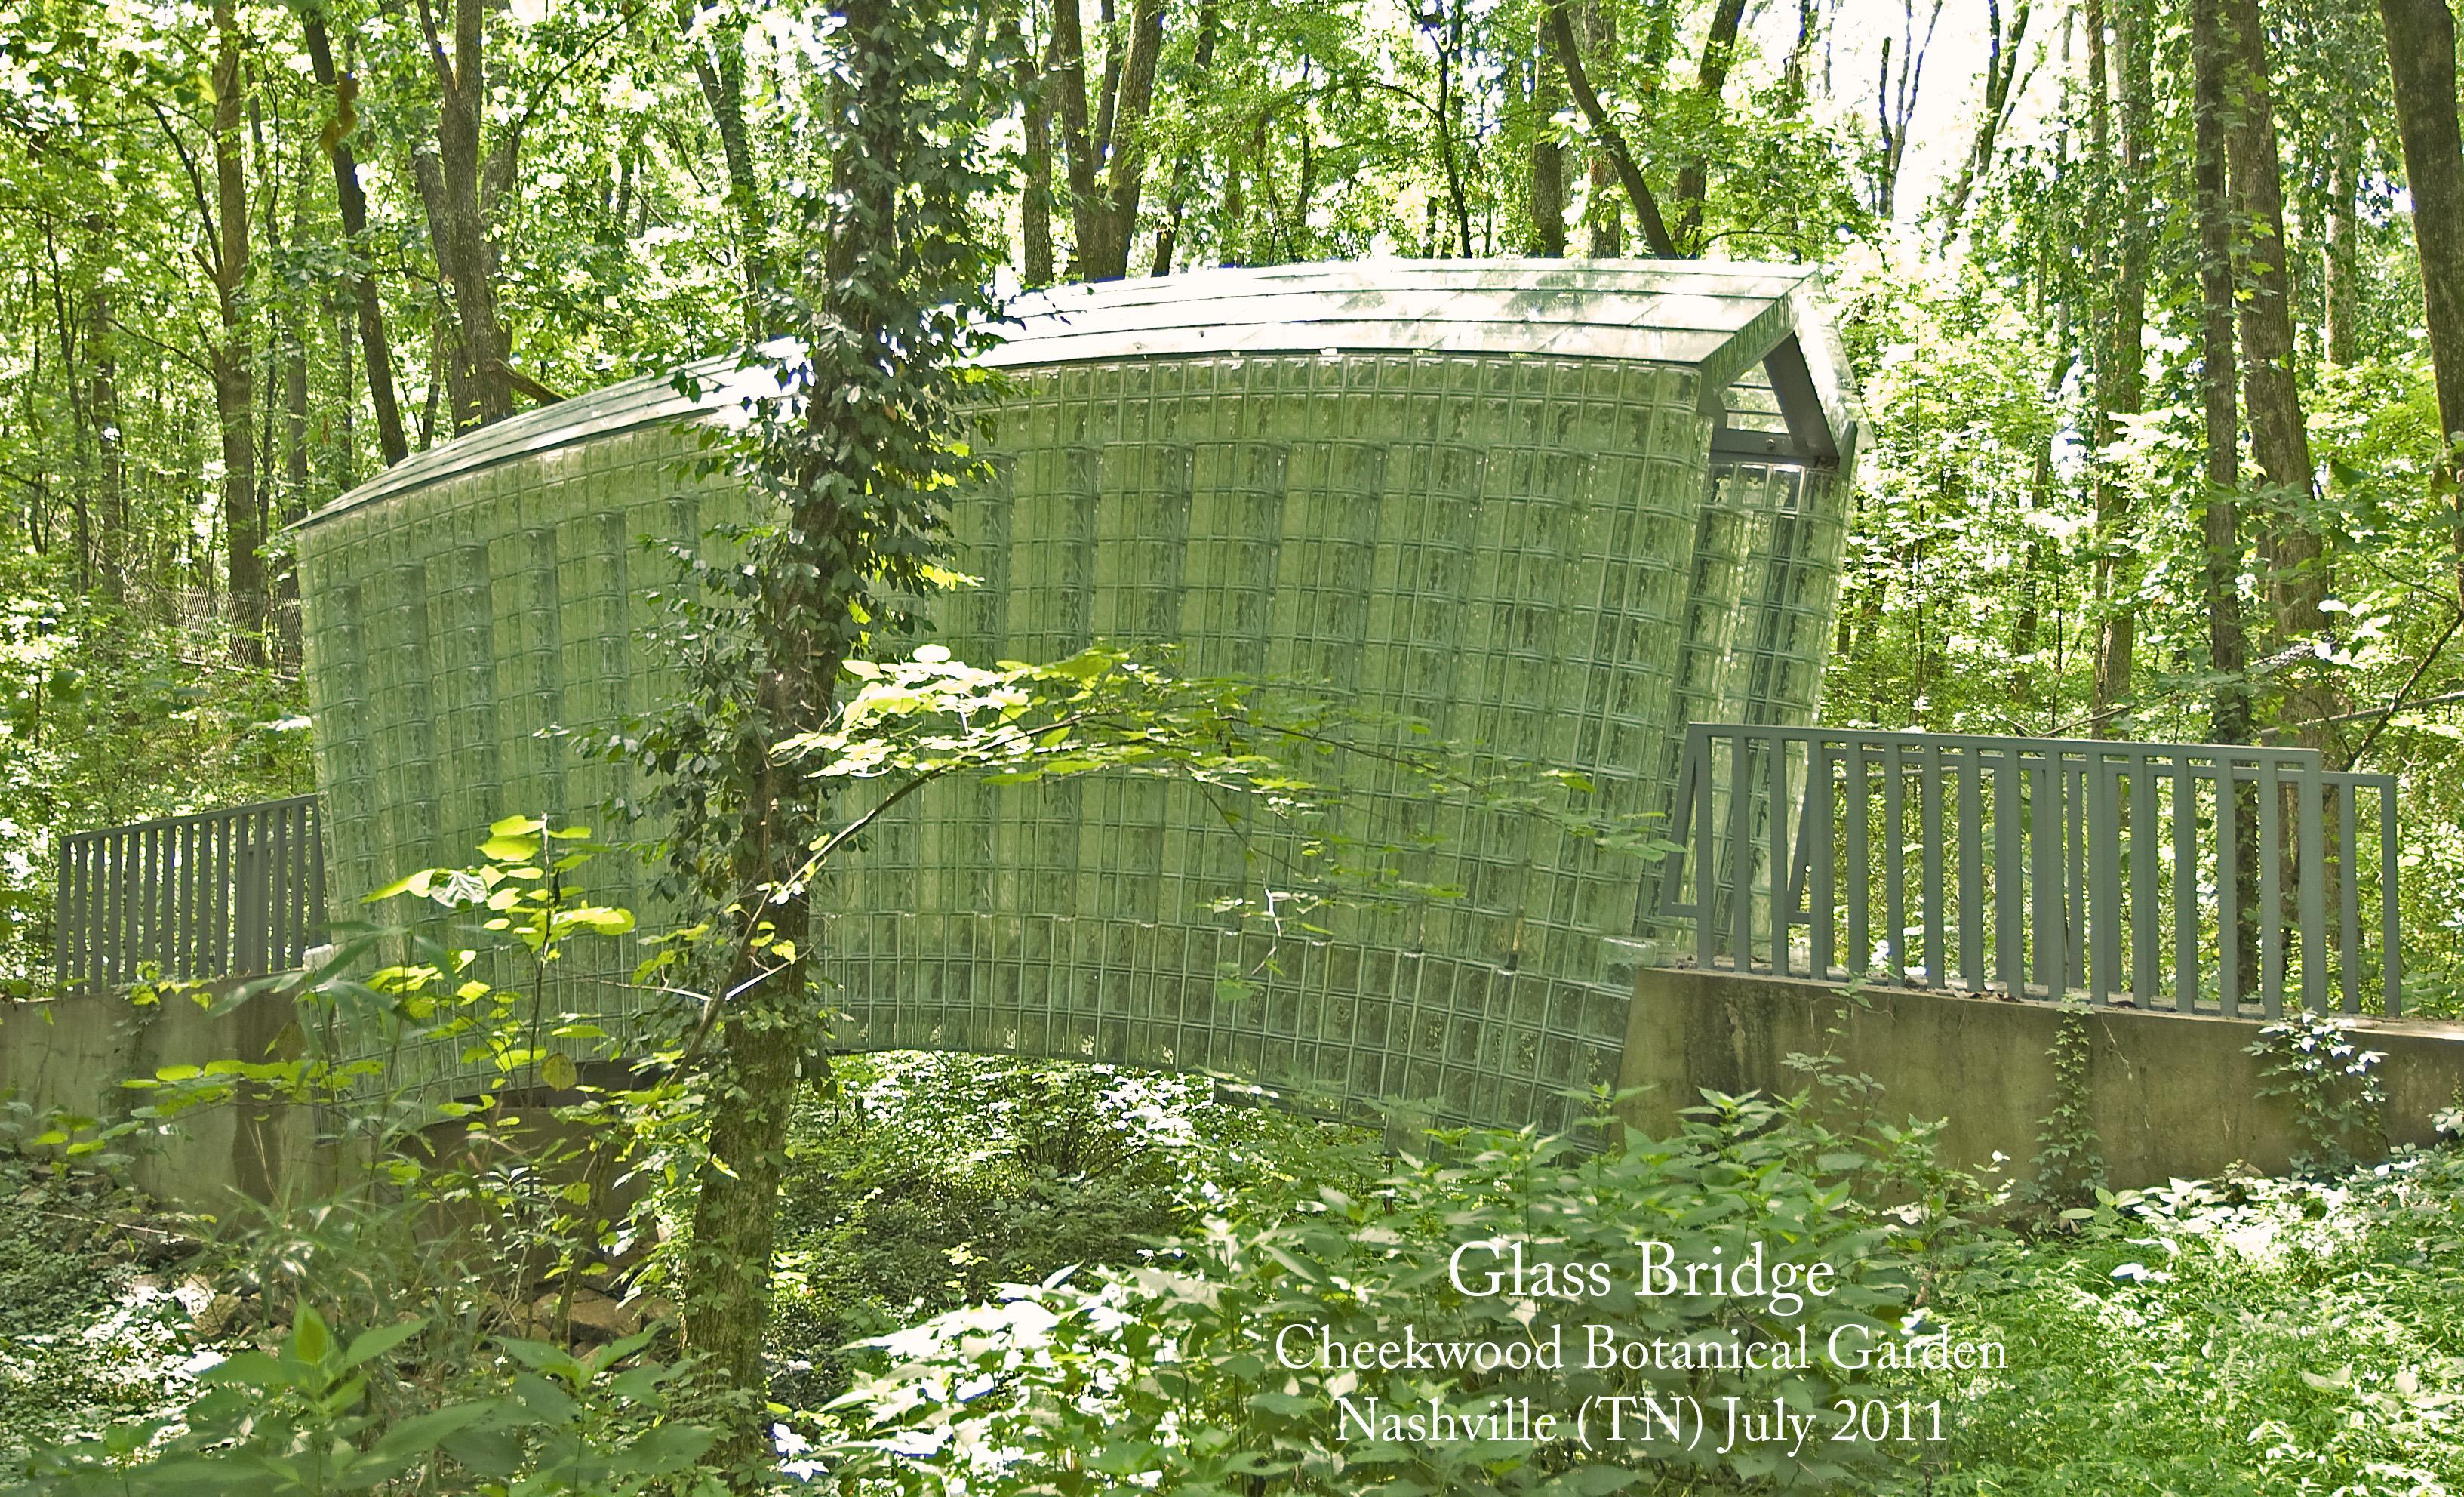 Glass Bridge Siah Armajani Cheekwood Botanical Garden Nashville Tn July 2011 Flickr